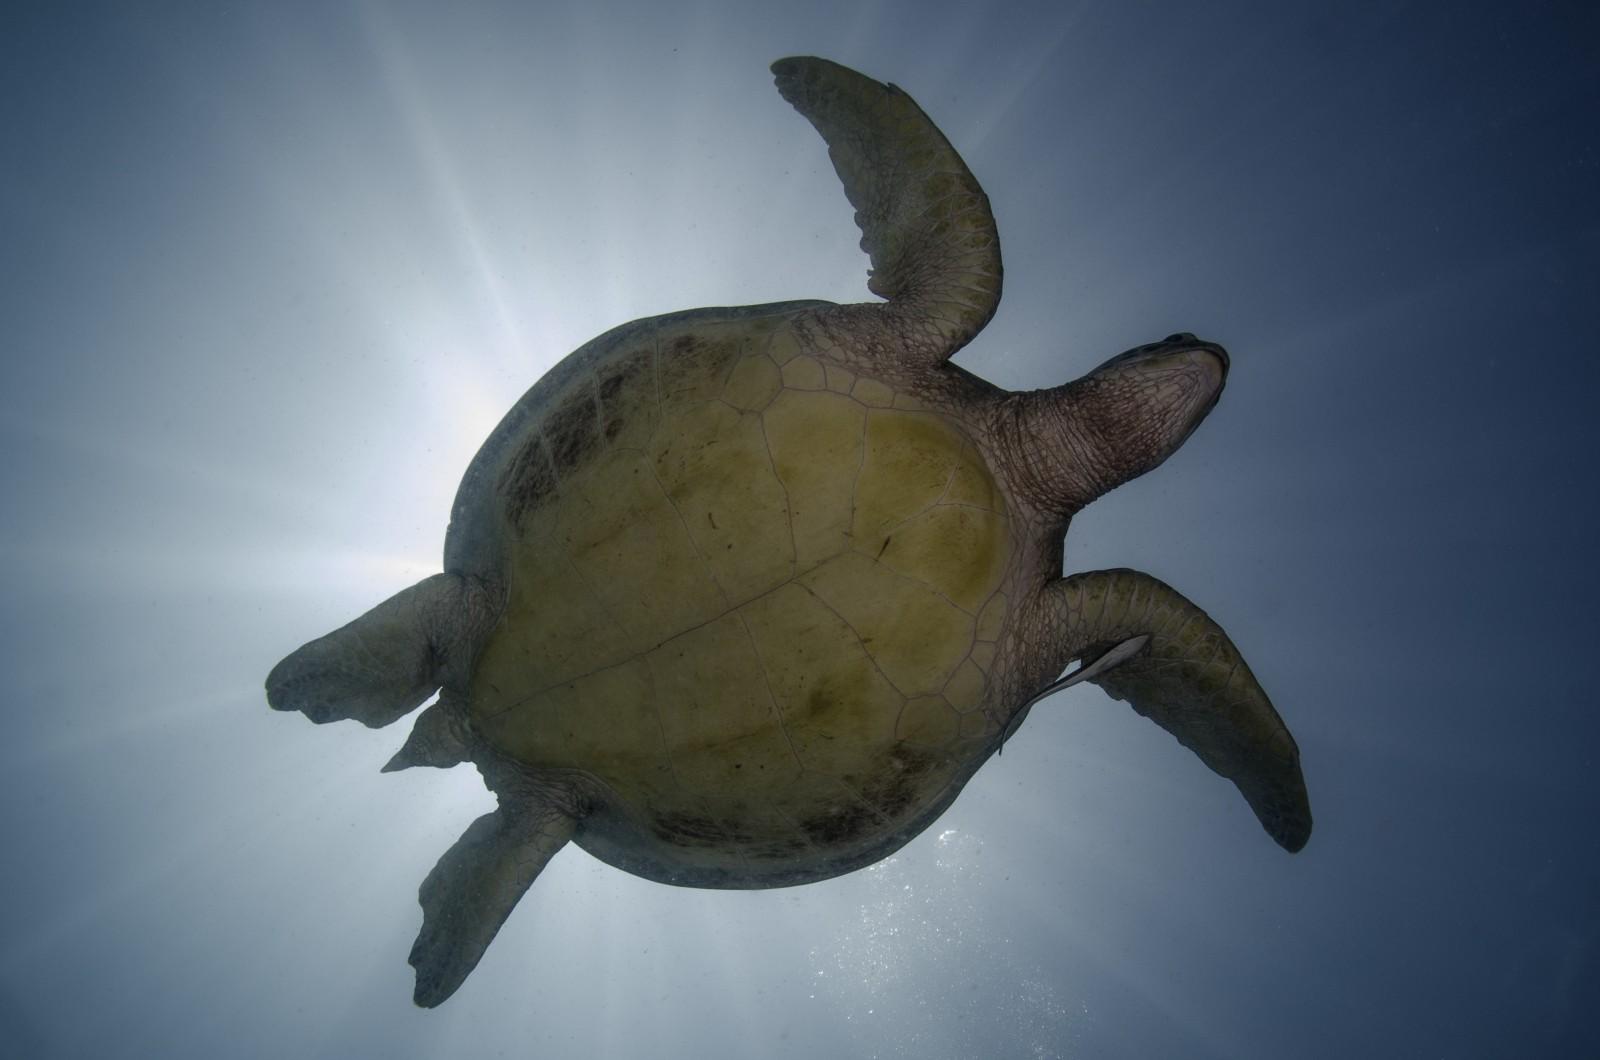 a-swimming-green-sea-turtle-chelonia-mydas-on-the-scuba-junkie-house-reef-mabul-island-tino-hermann1.jpg